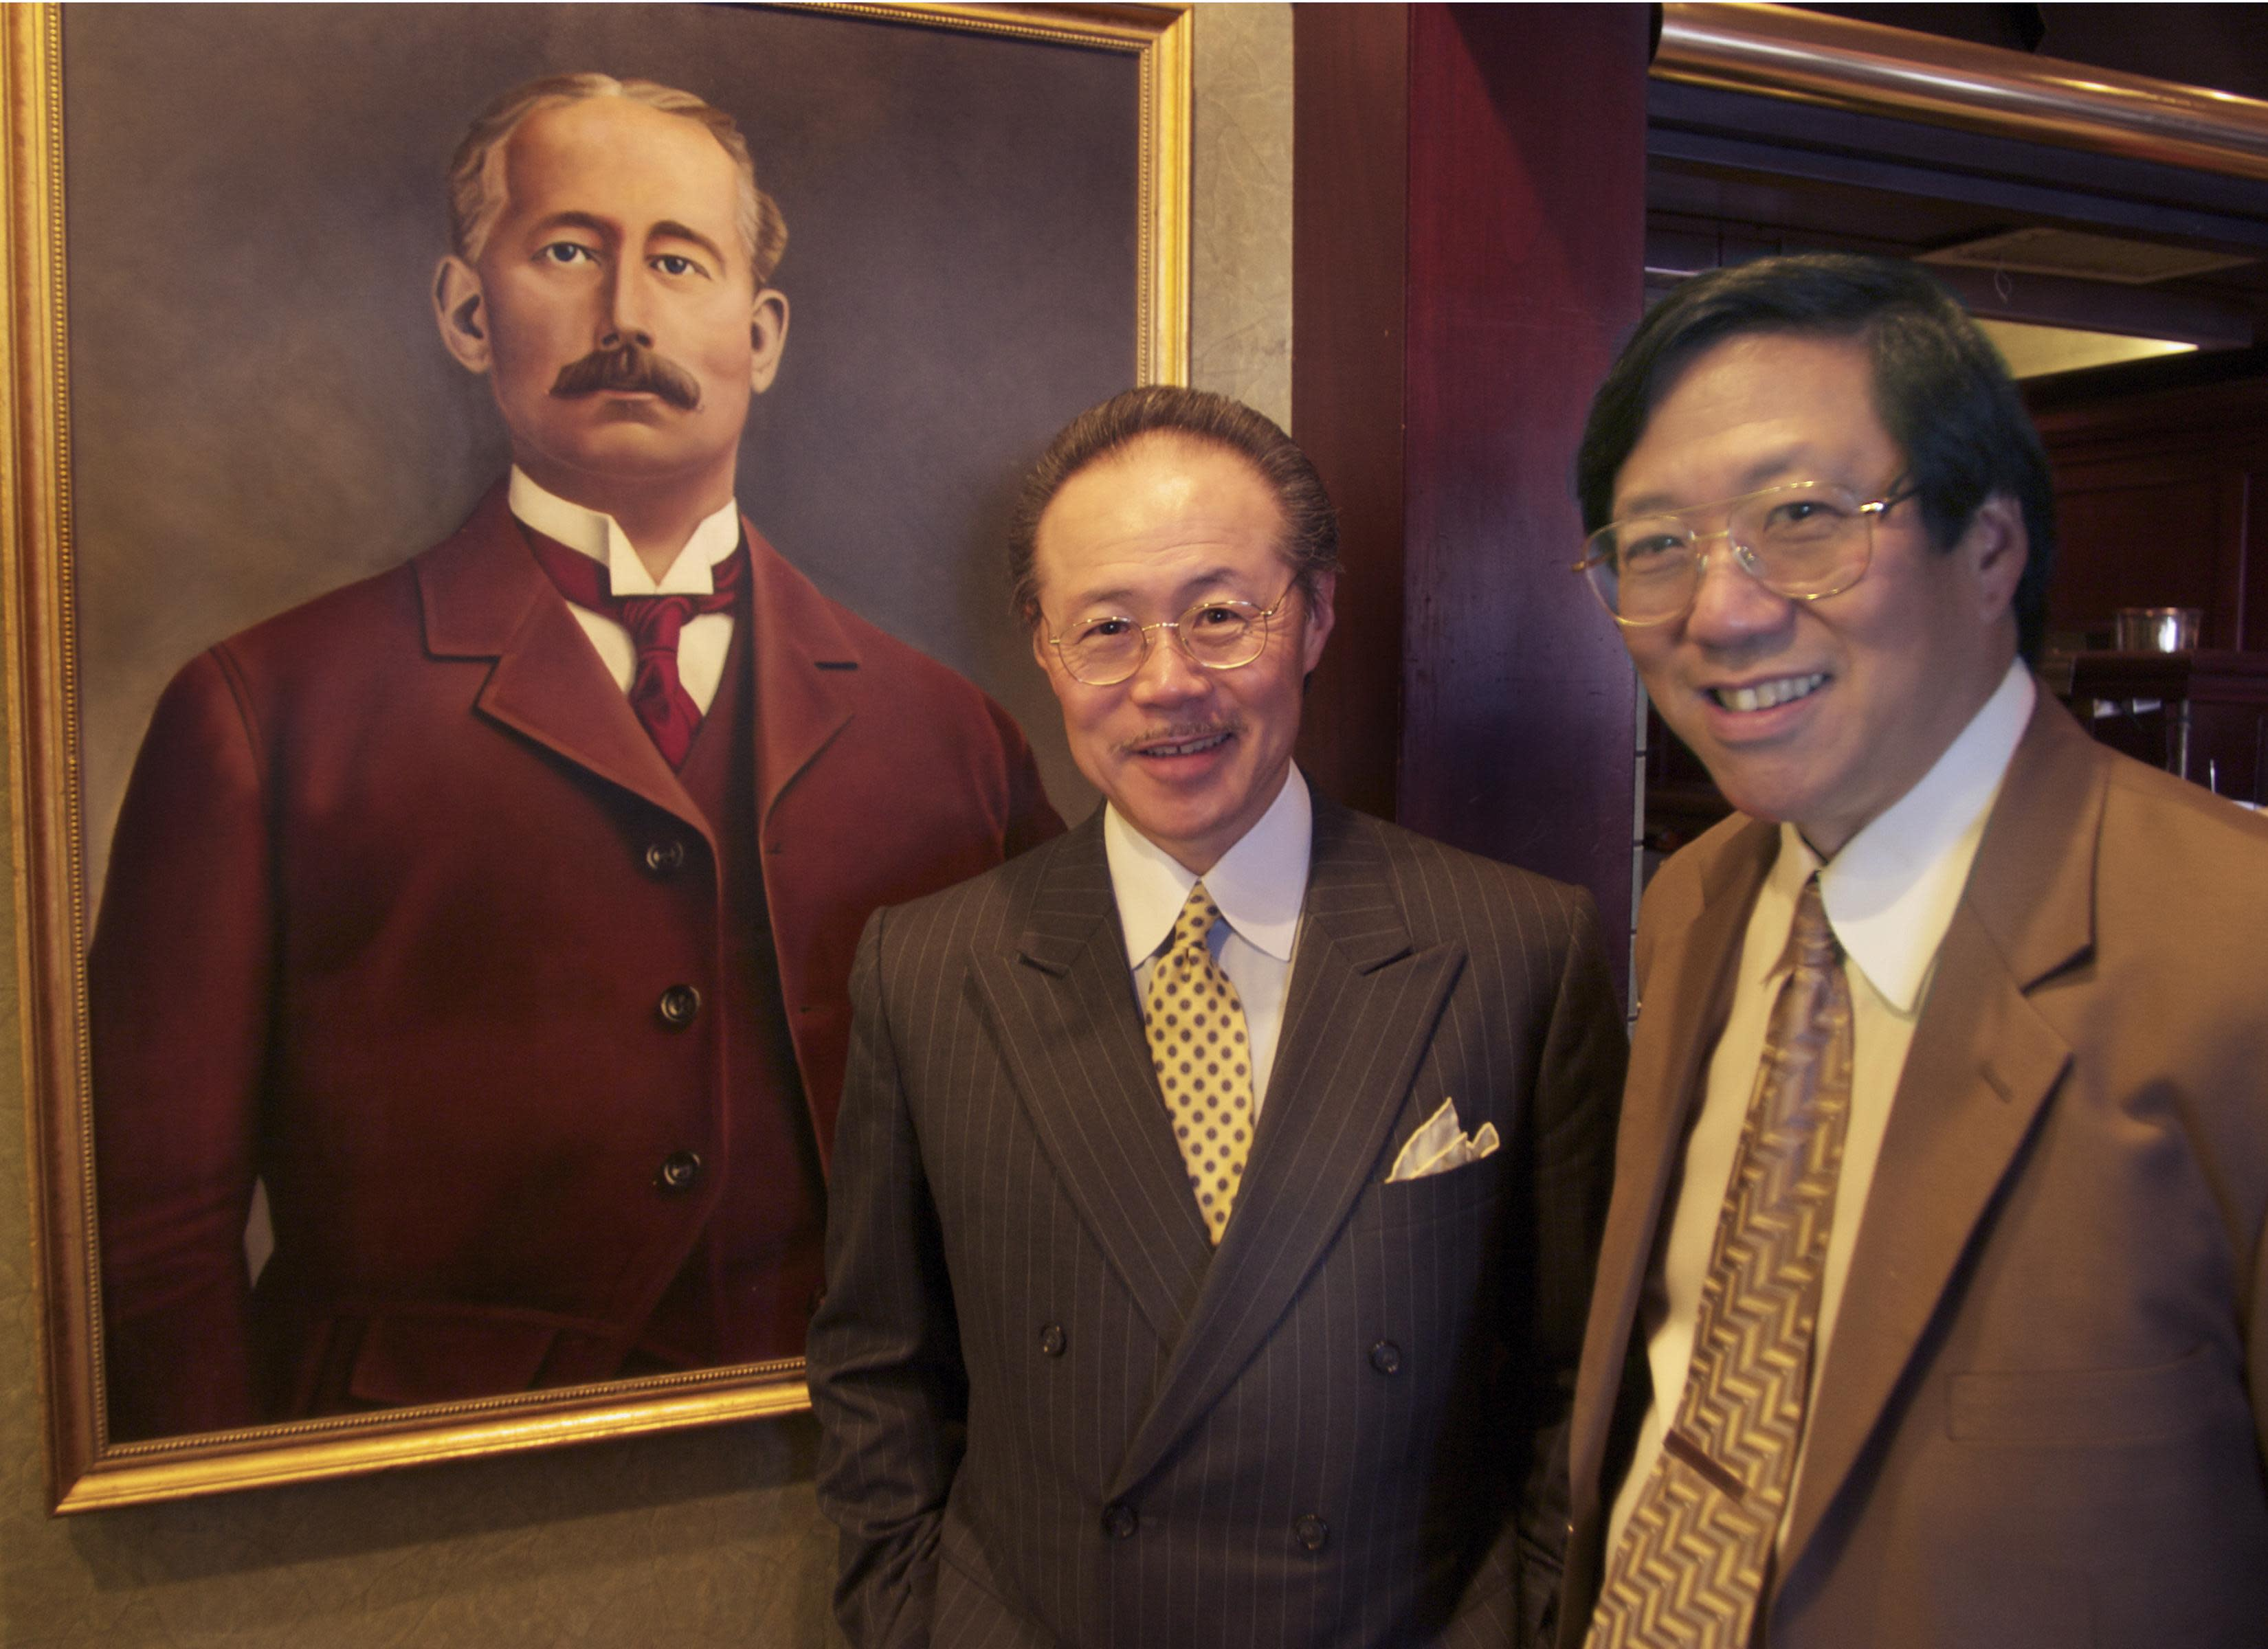 Proprietors at Huber's Restaurant